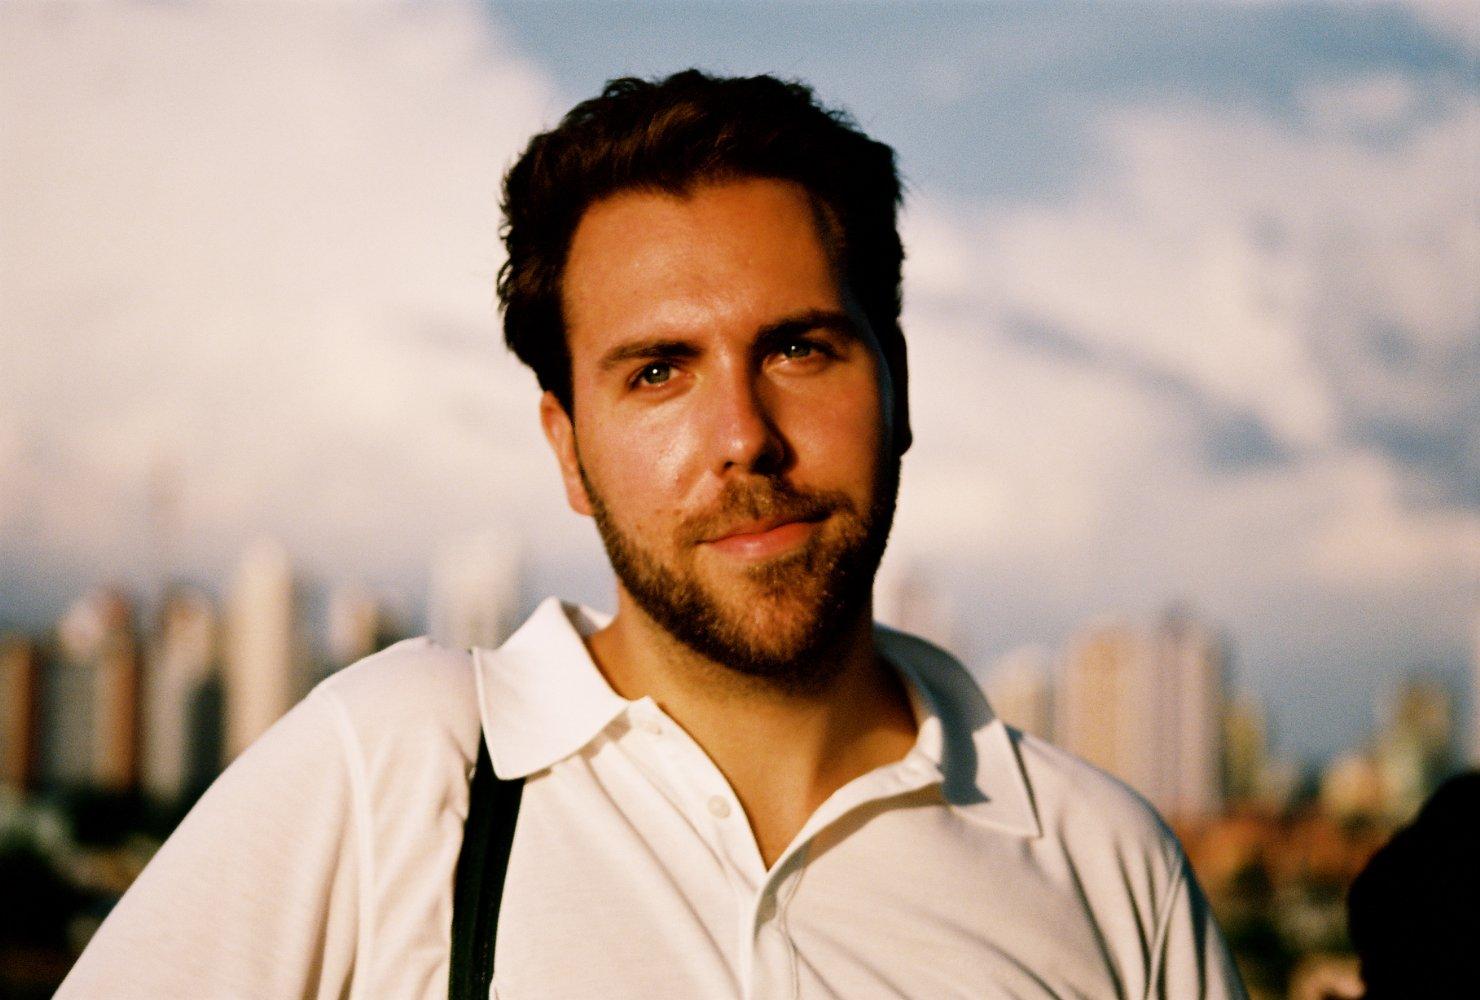 Vincent M. Biscione